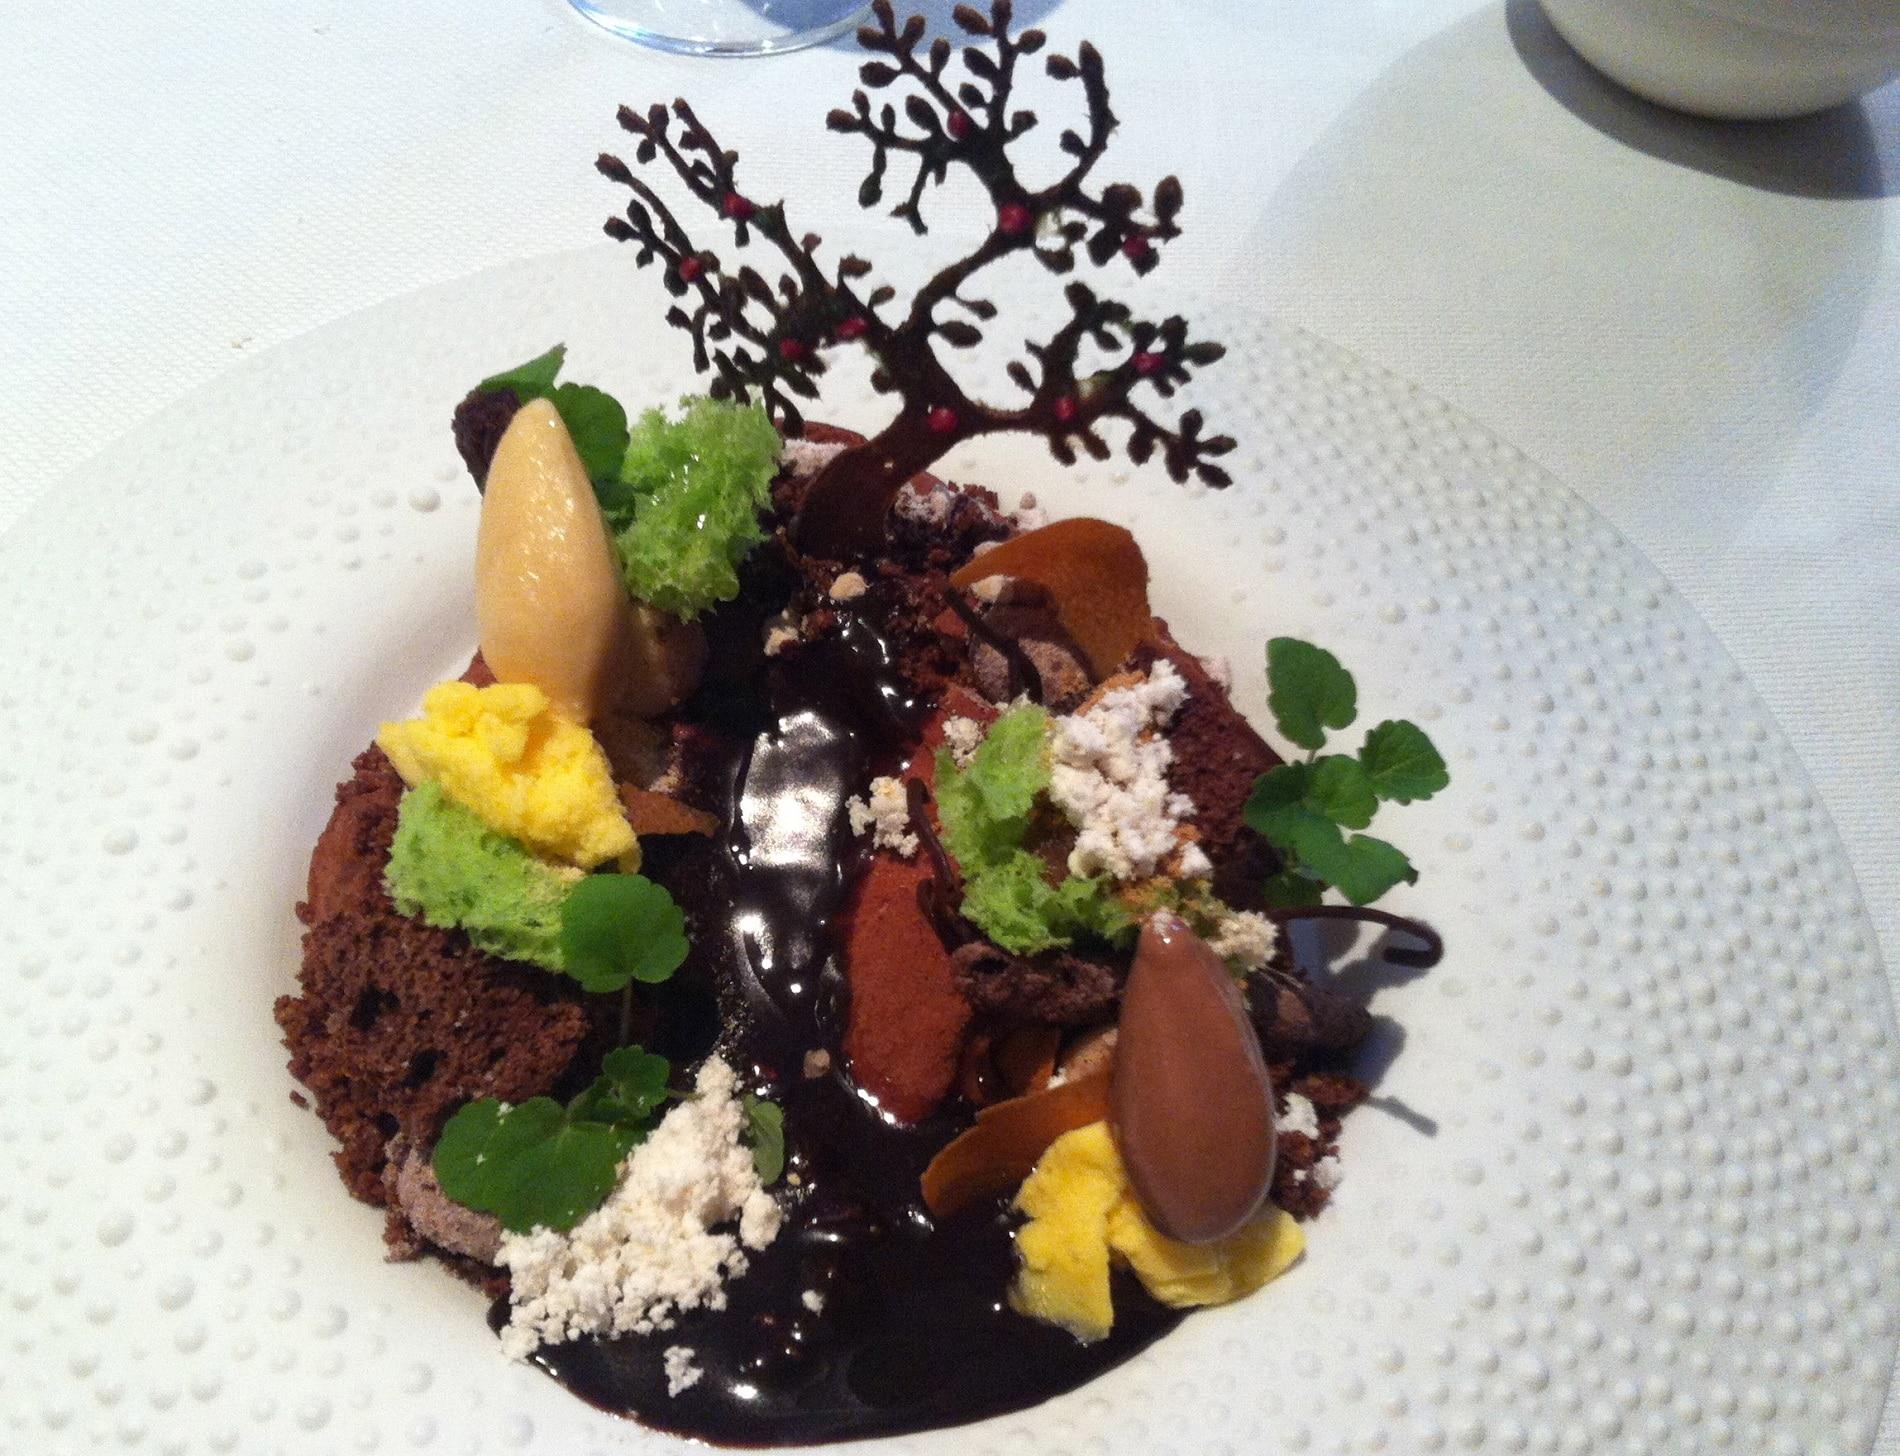 Botanique - Specialitate din ciocolată de la restaurantul cu specific Het Gebaar din Antwerp, Belgia